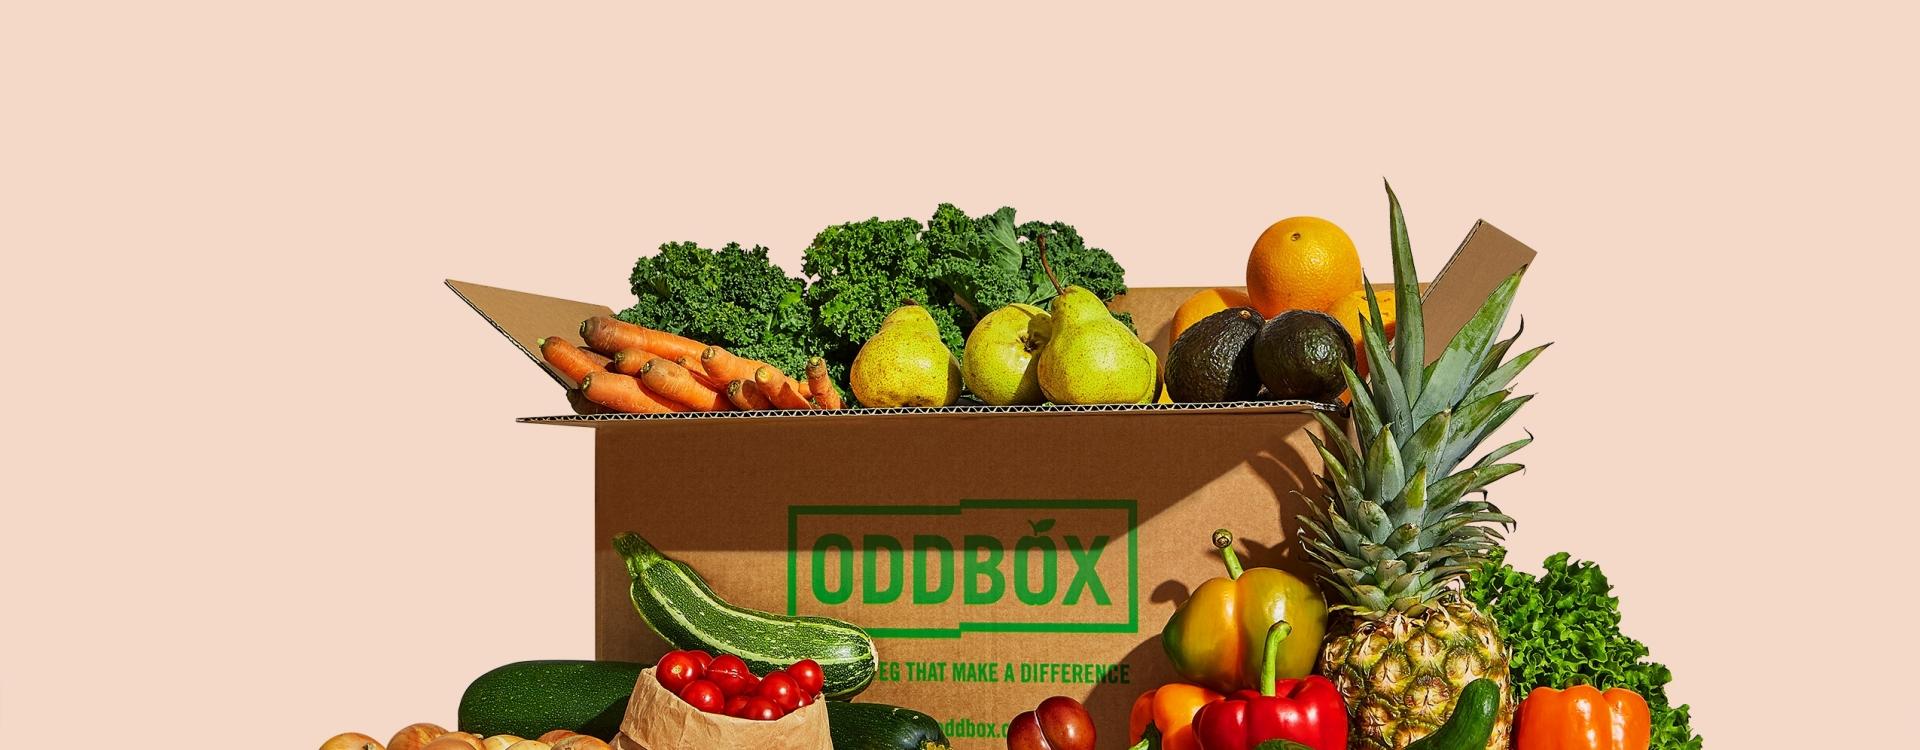 Brands oddbox 01